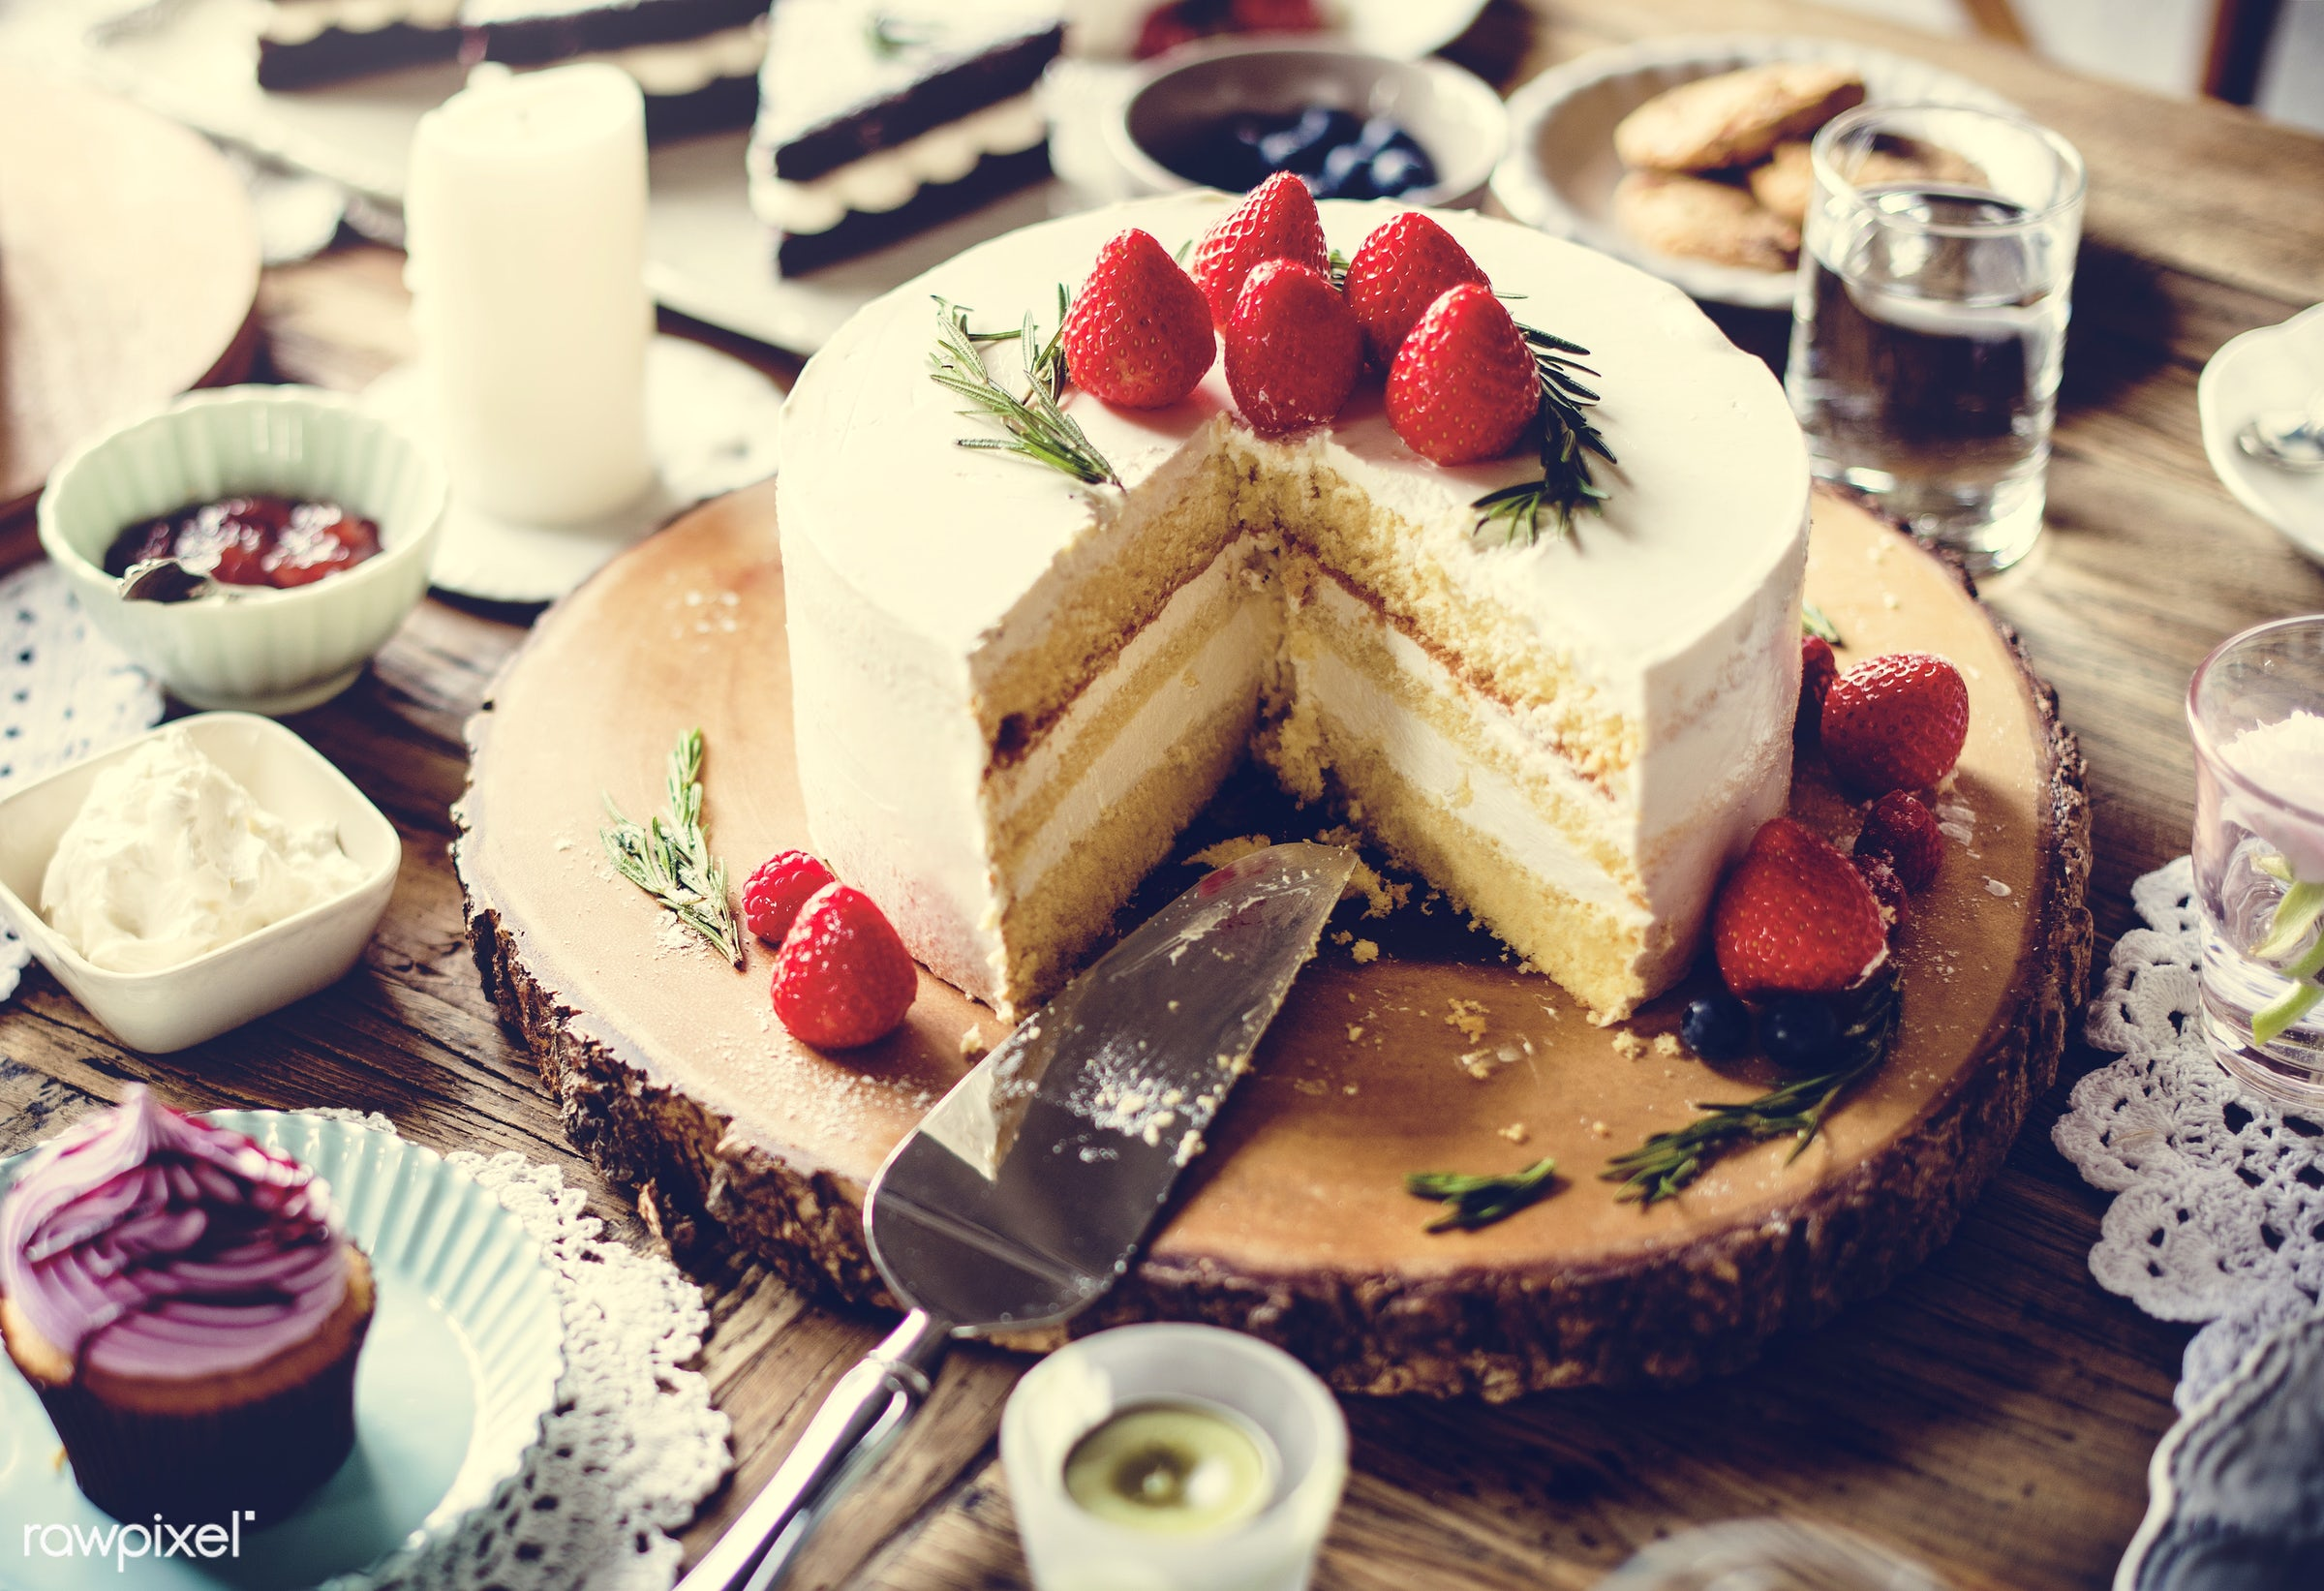 dish, nobody, recipe, party, tea, tea party, break, bakery, frosting, event, gourmet, dessert, cake, fruit, strawberry,...